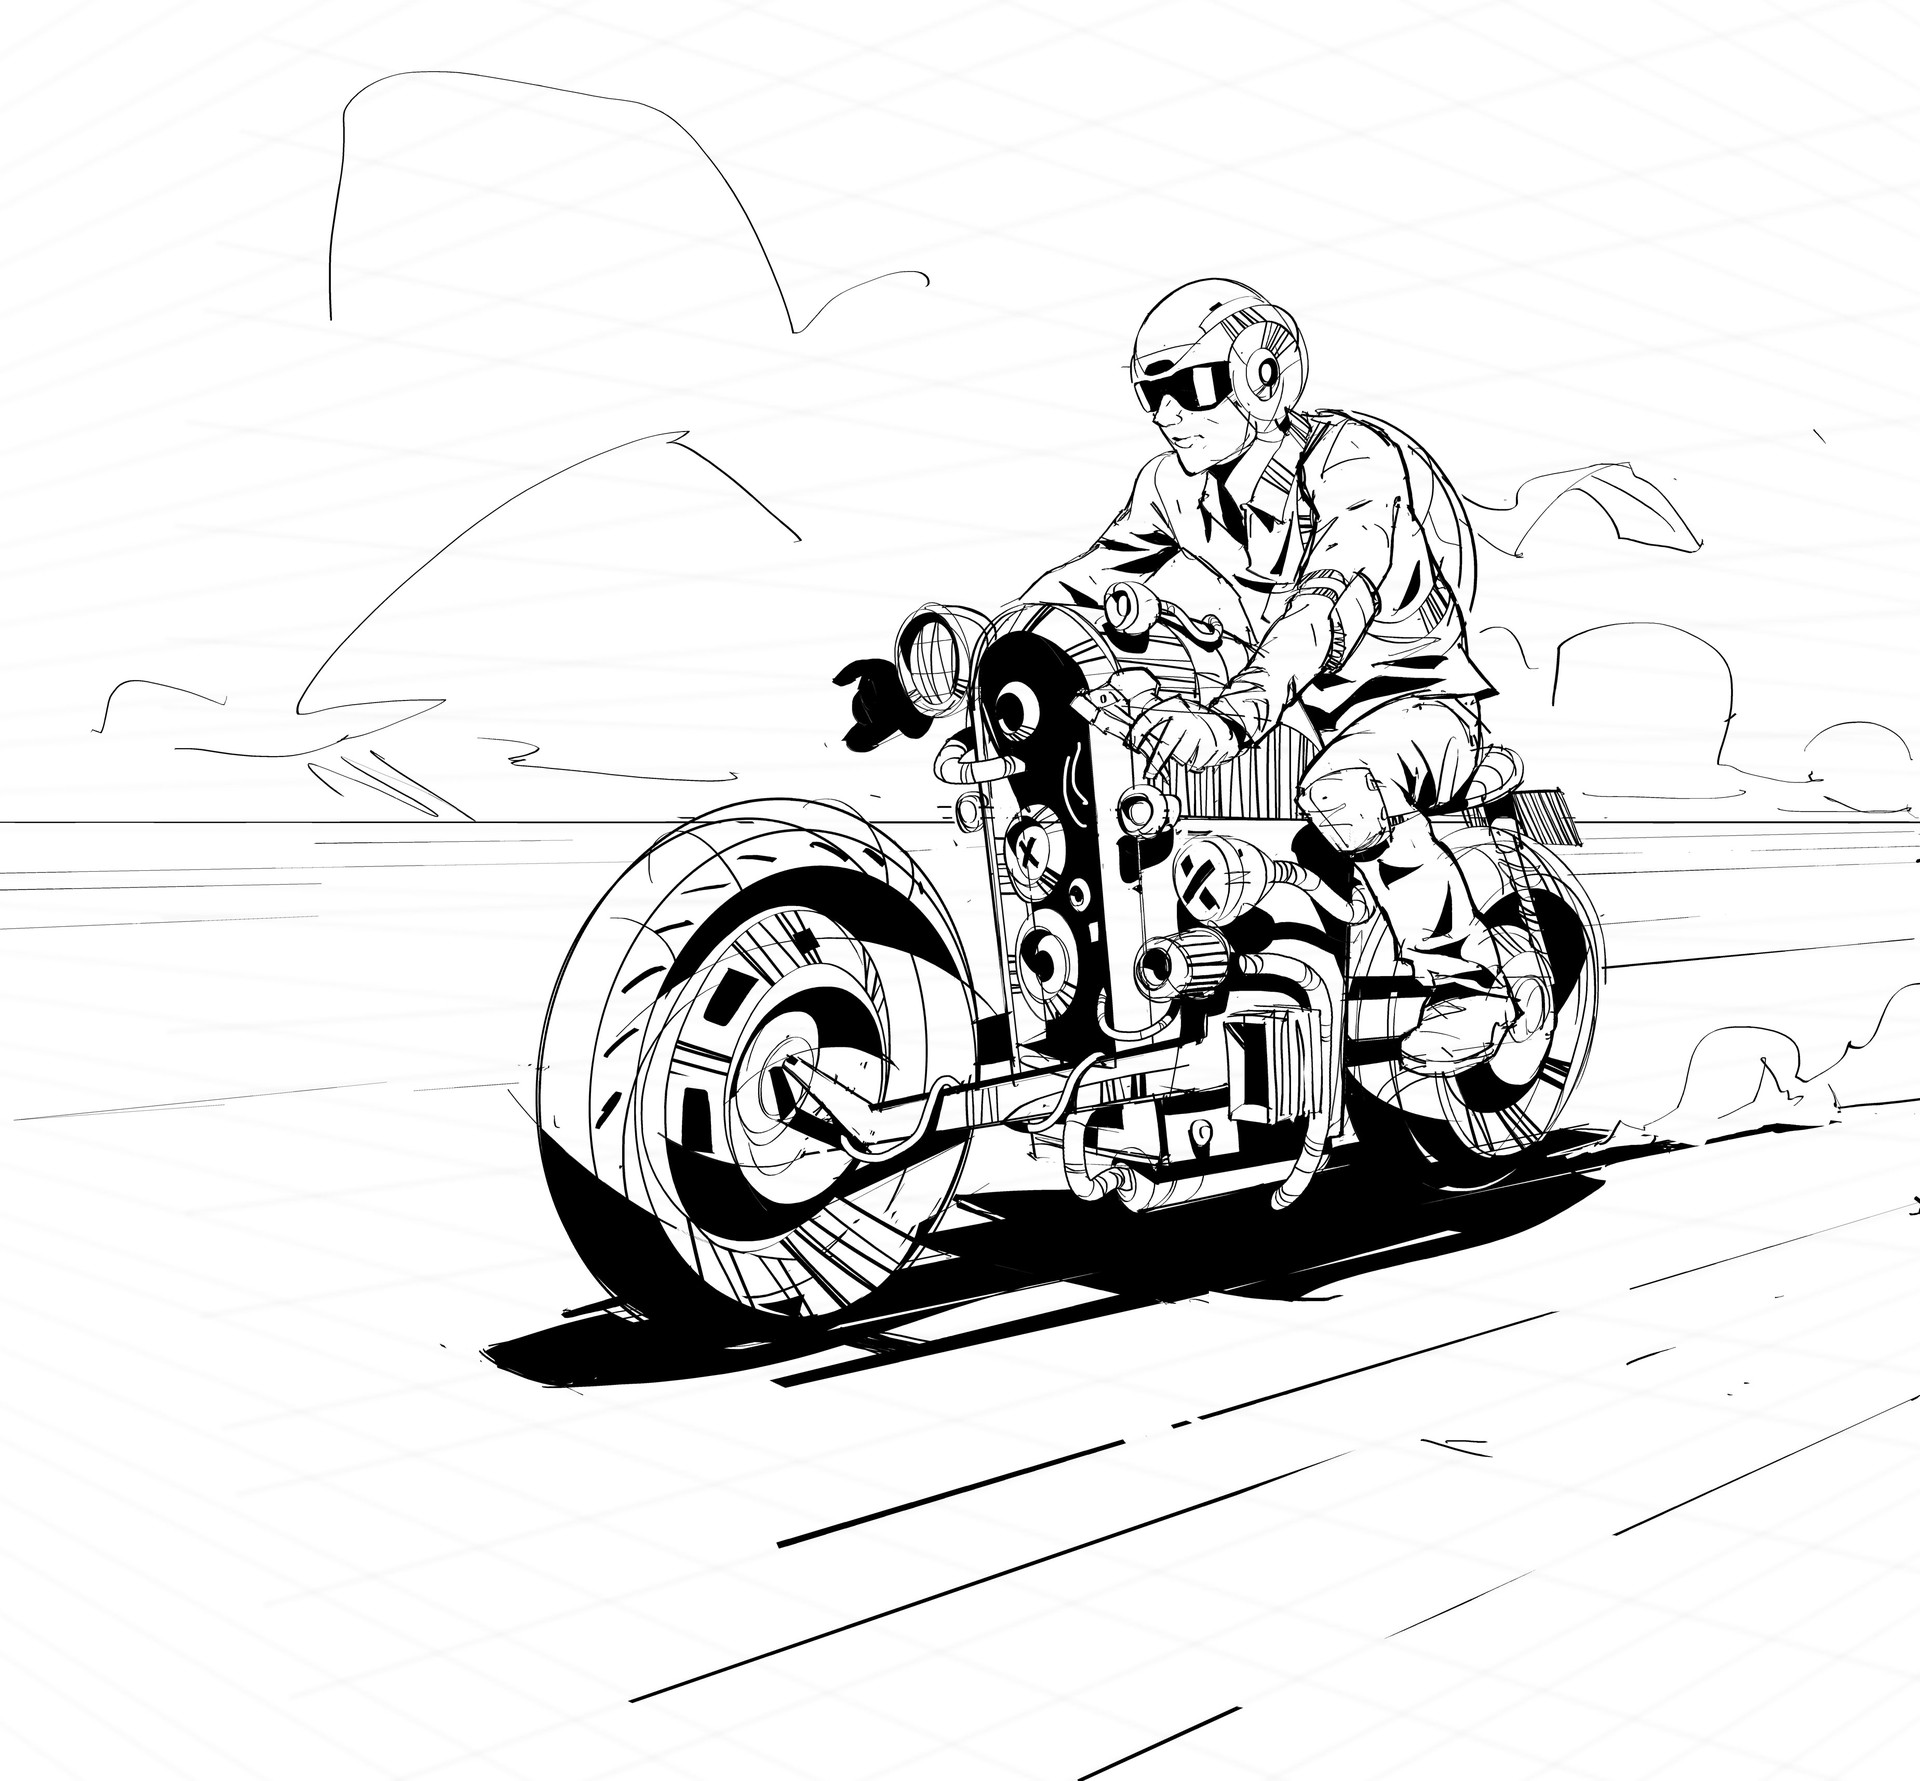 Matt tkocz brushpen sketch6